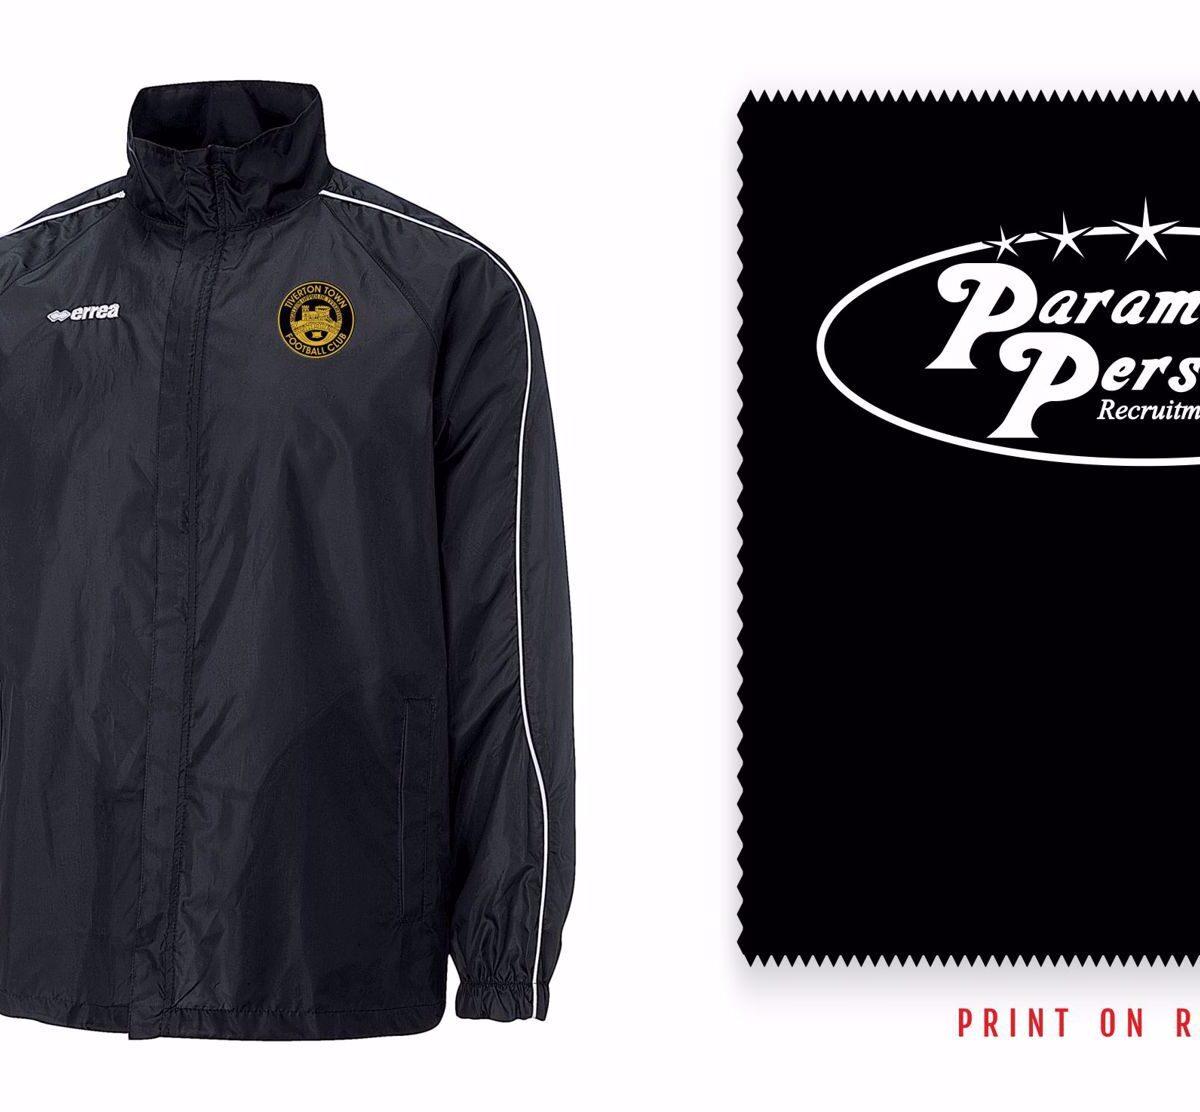 Tiverton Town Development FC Rain Jacket - Errea Basic B670 00012